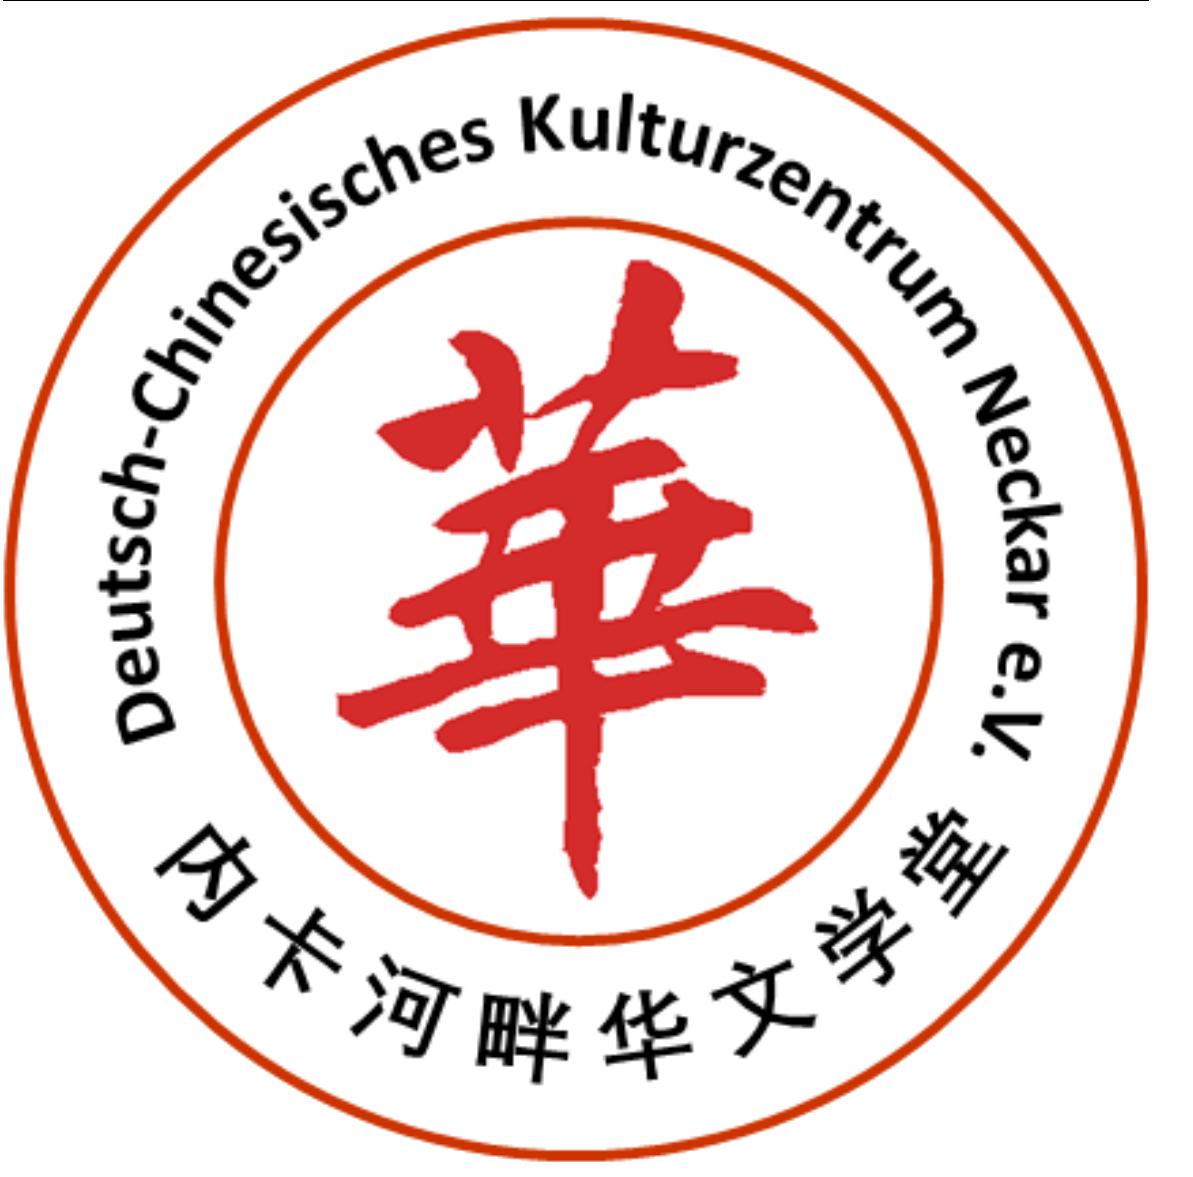 Deutsch-Chinesisches Kulturzentrum Neckar e.V.